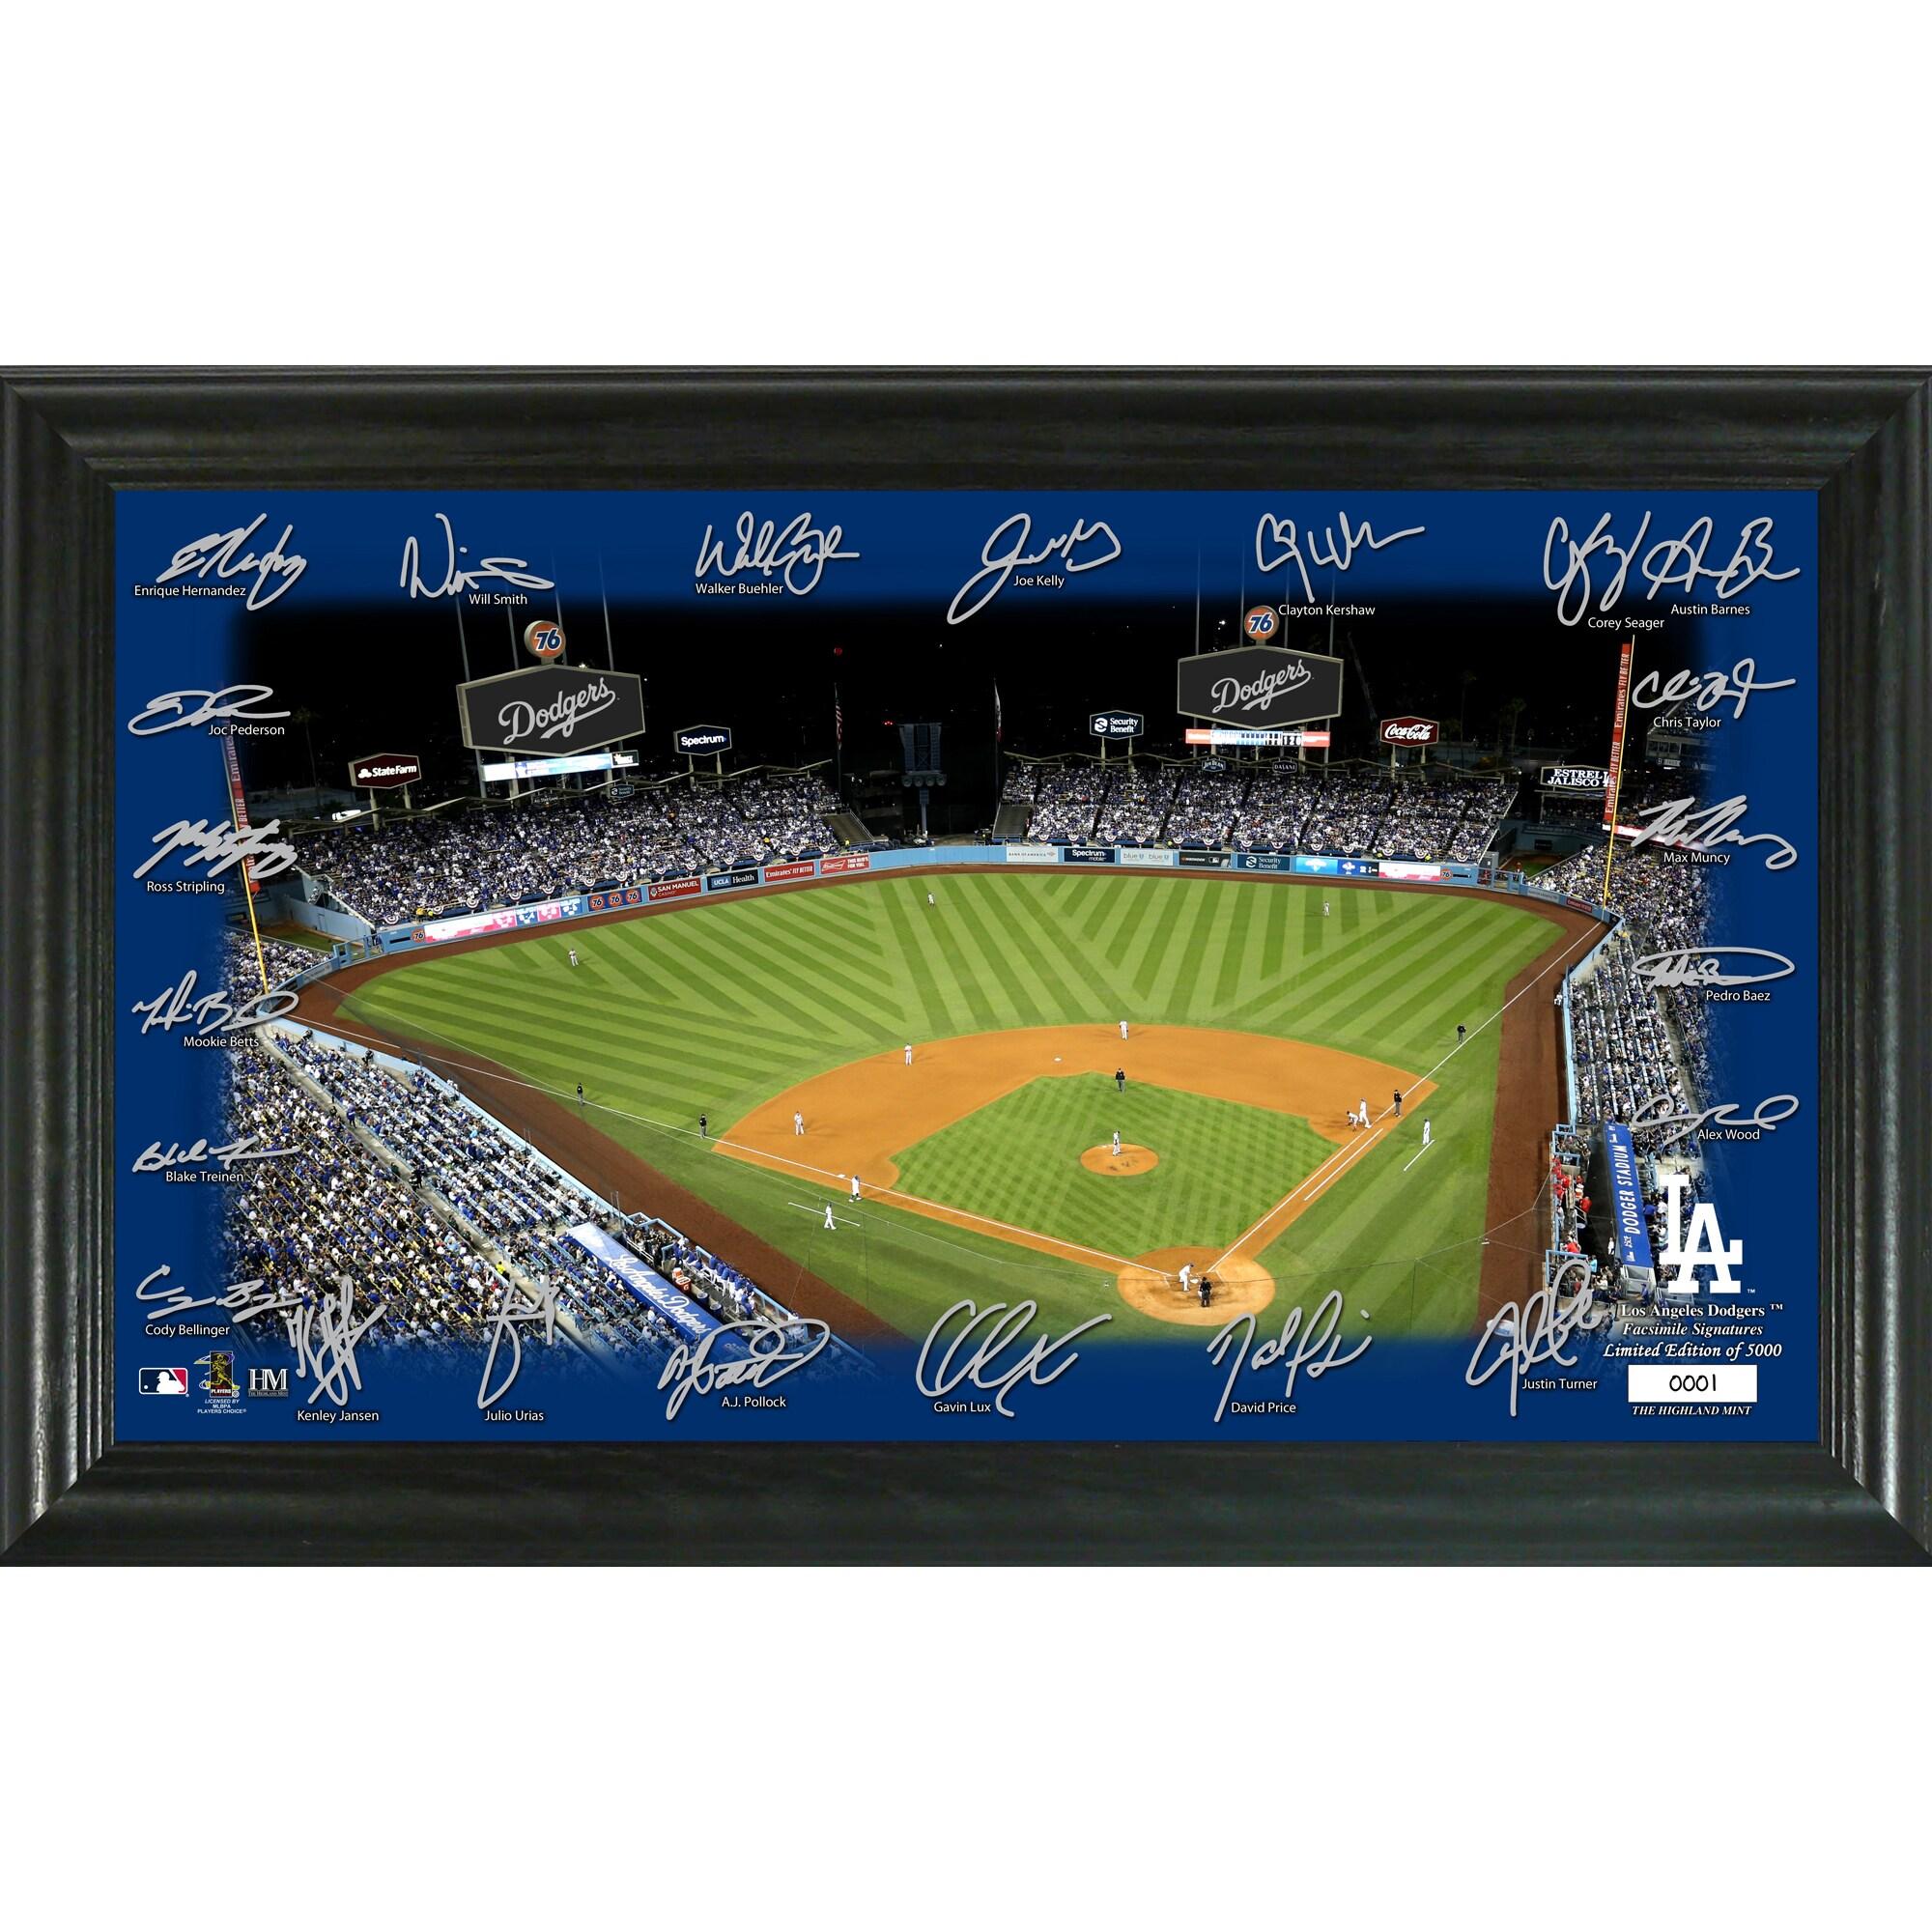 Los Angeles Dodgers Highland Mint 12'' x 20'' Signature Field Limited Editon Framed Photo Mint